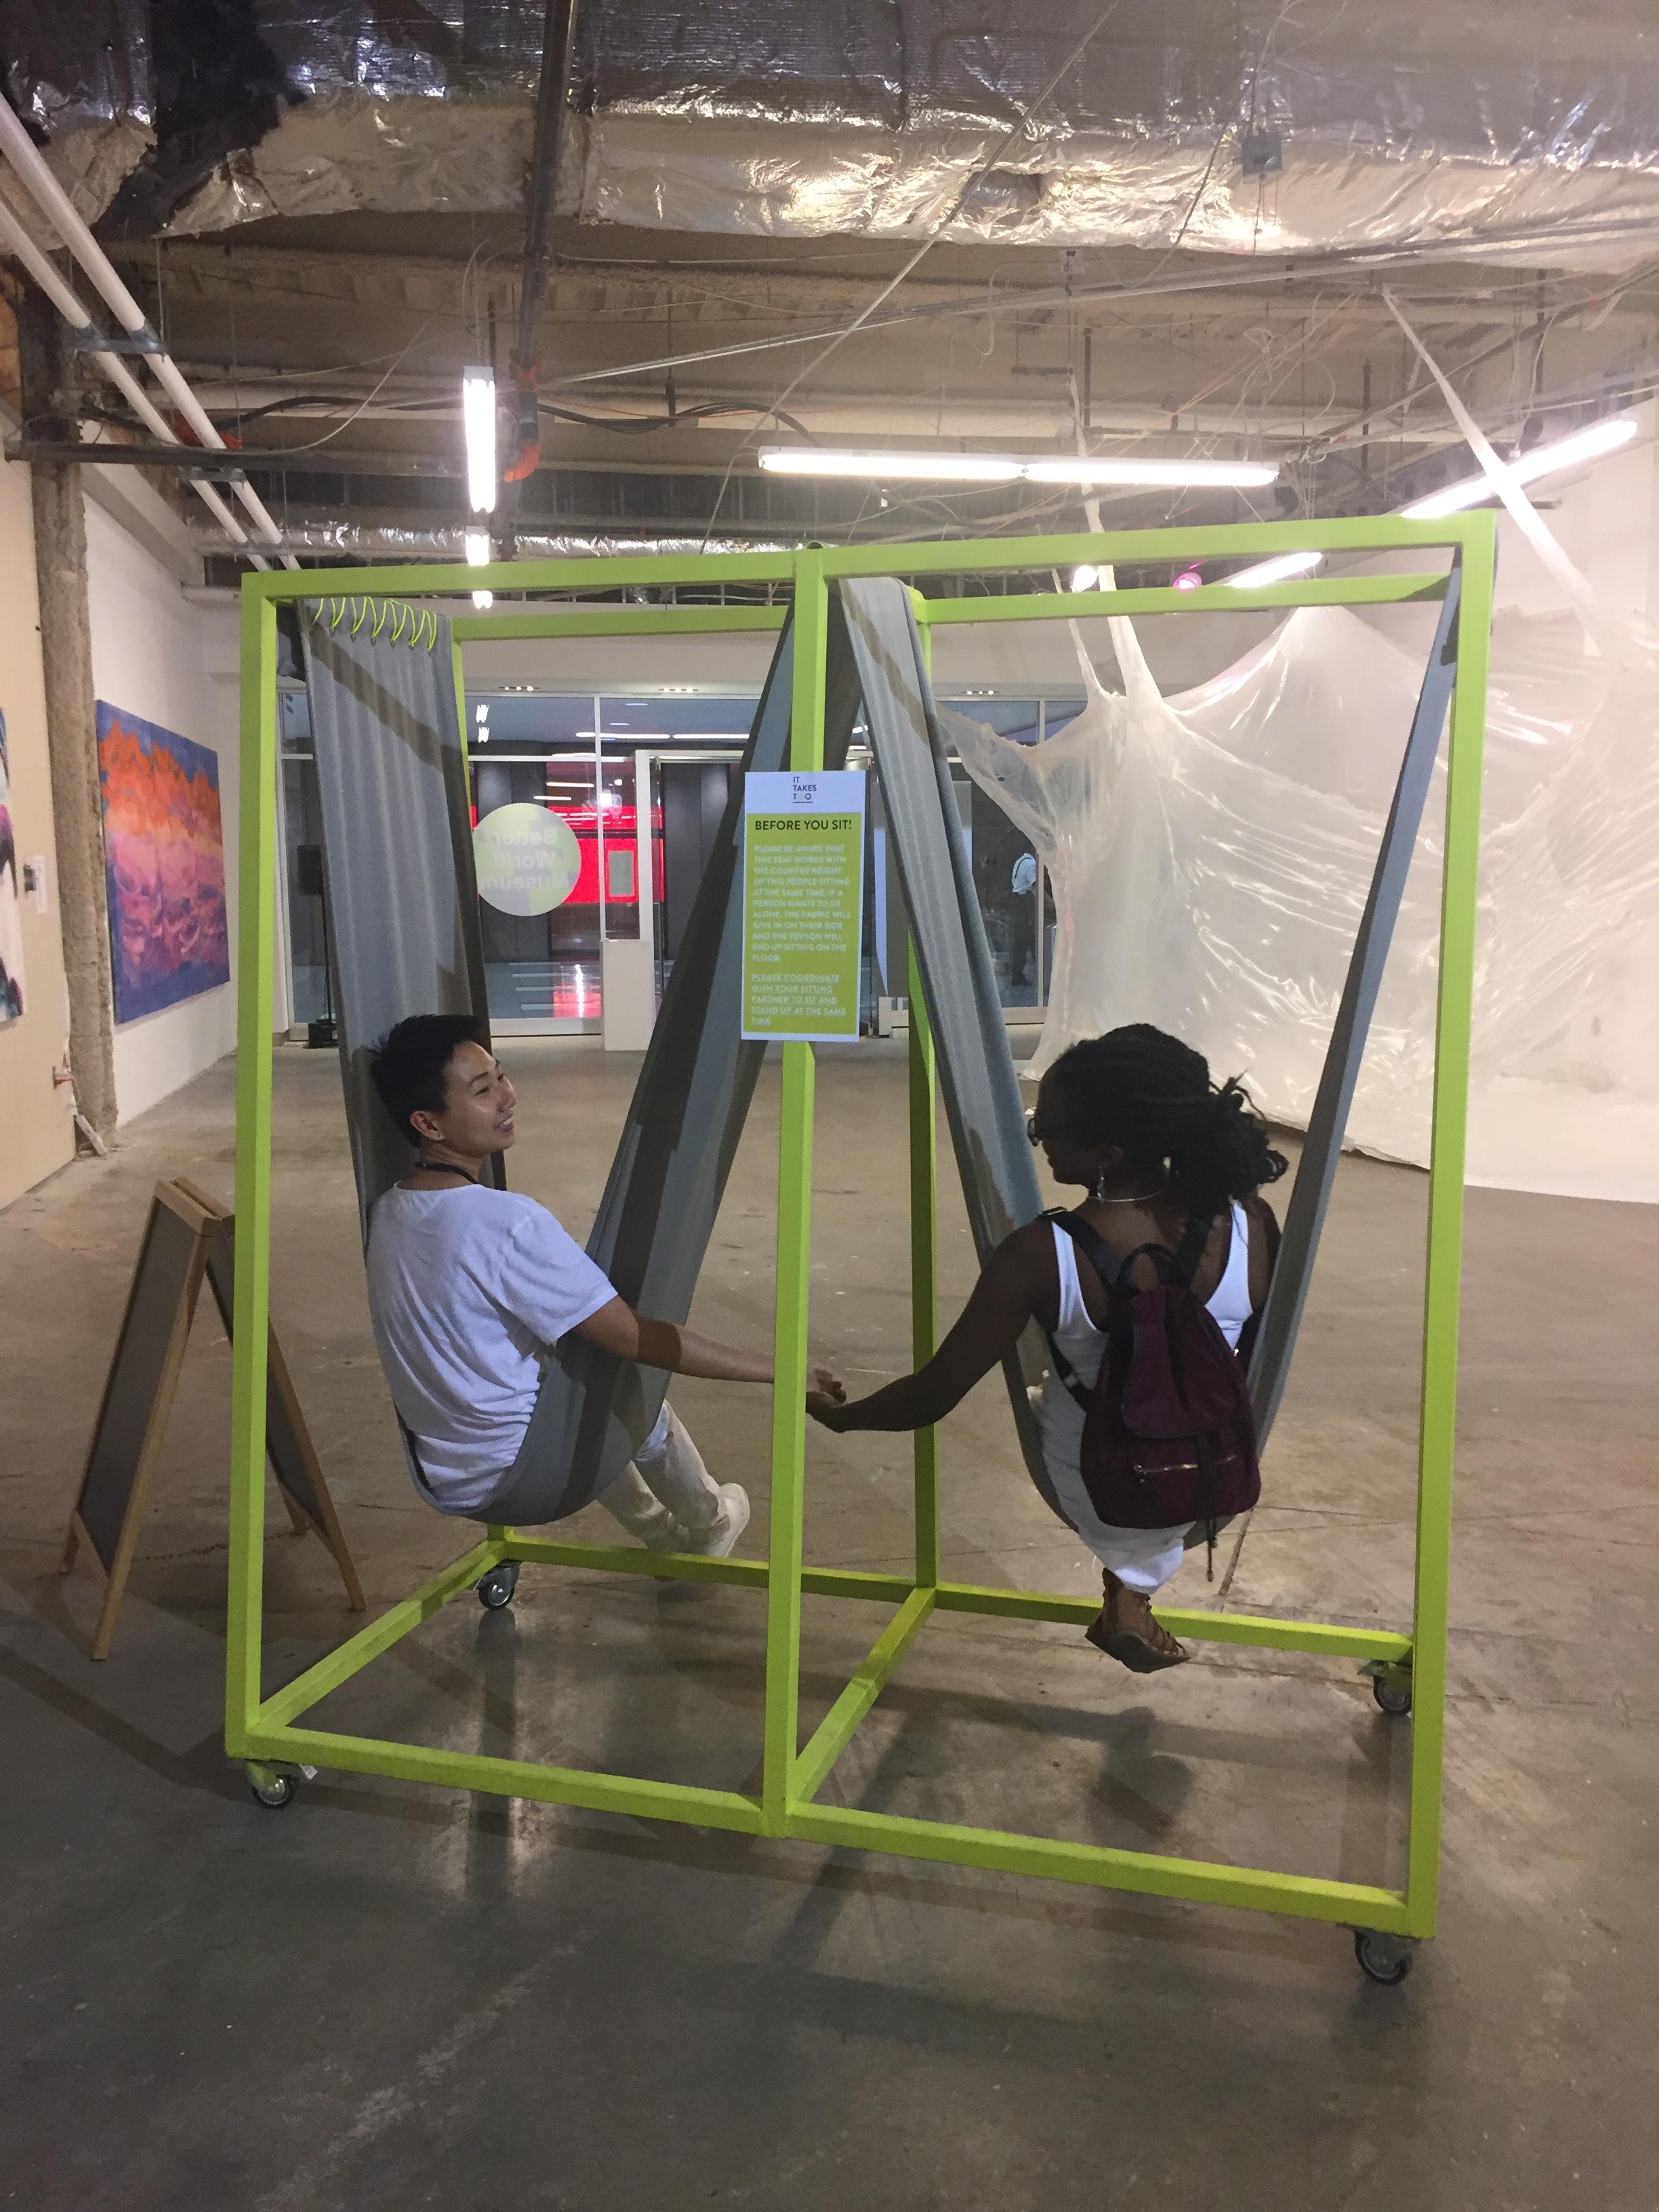 """It Tales Two"" Zoe Cinel, Frankie Jose Skar, 2017. Frankie Yu and Janell holding hands."